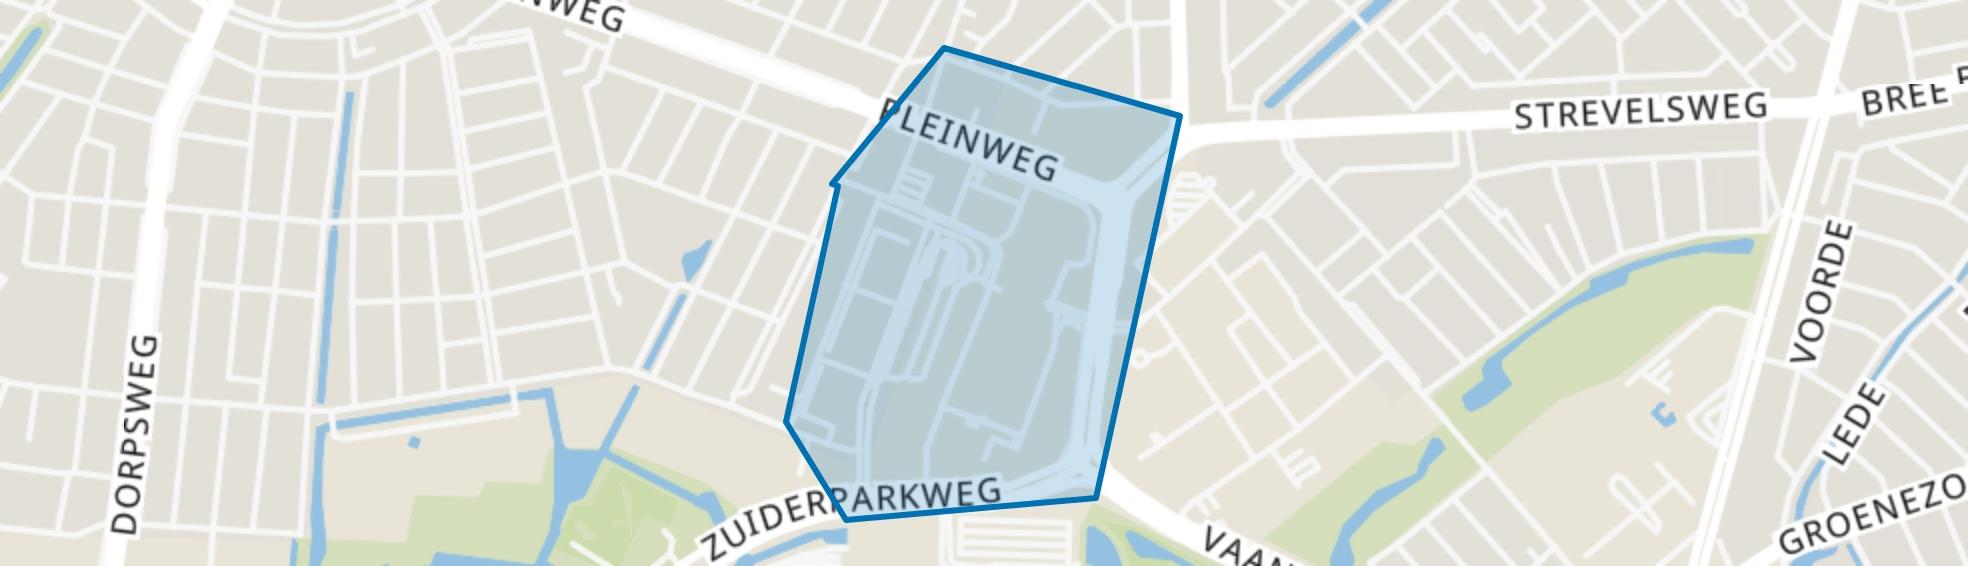 Zuidplein, Rotterdam map